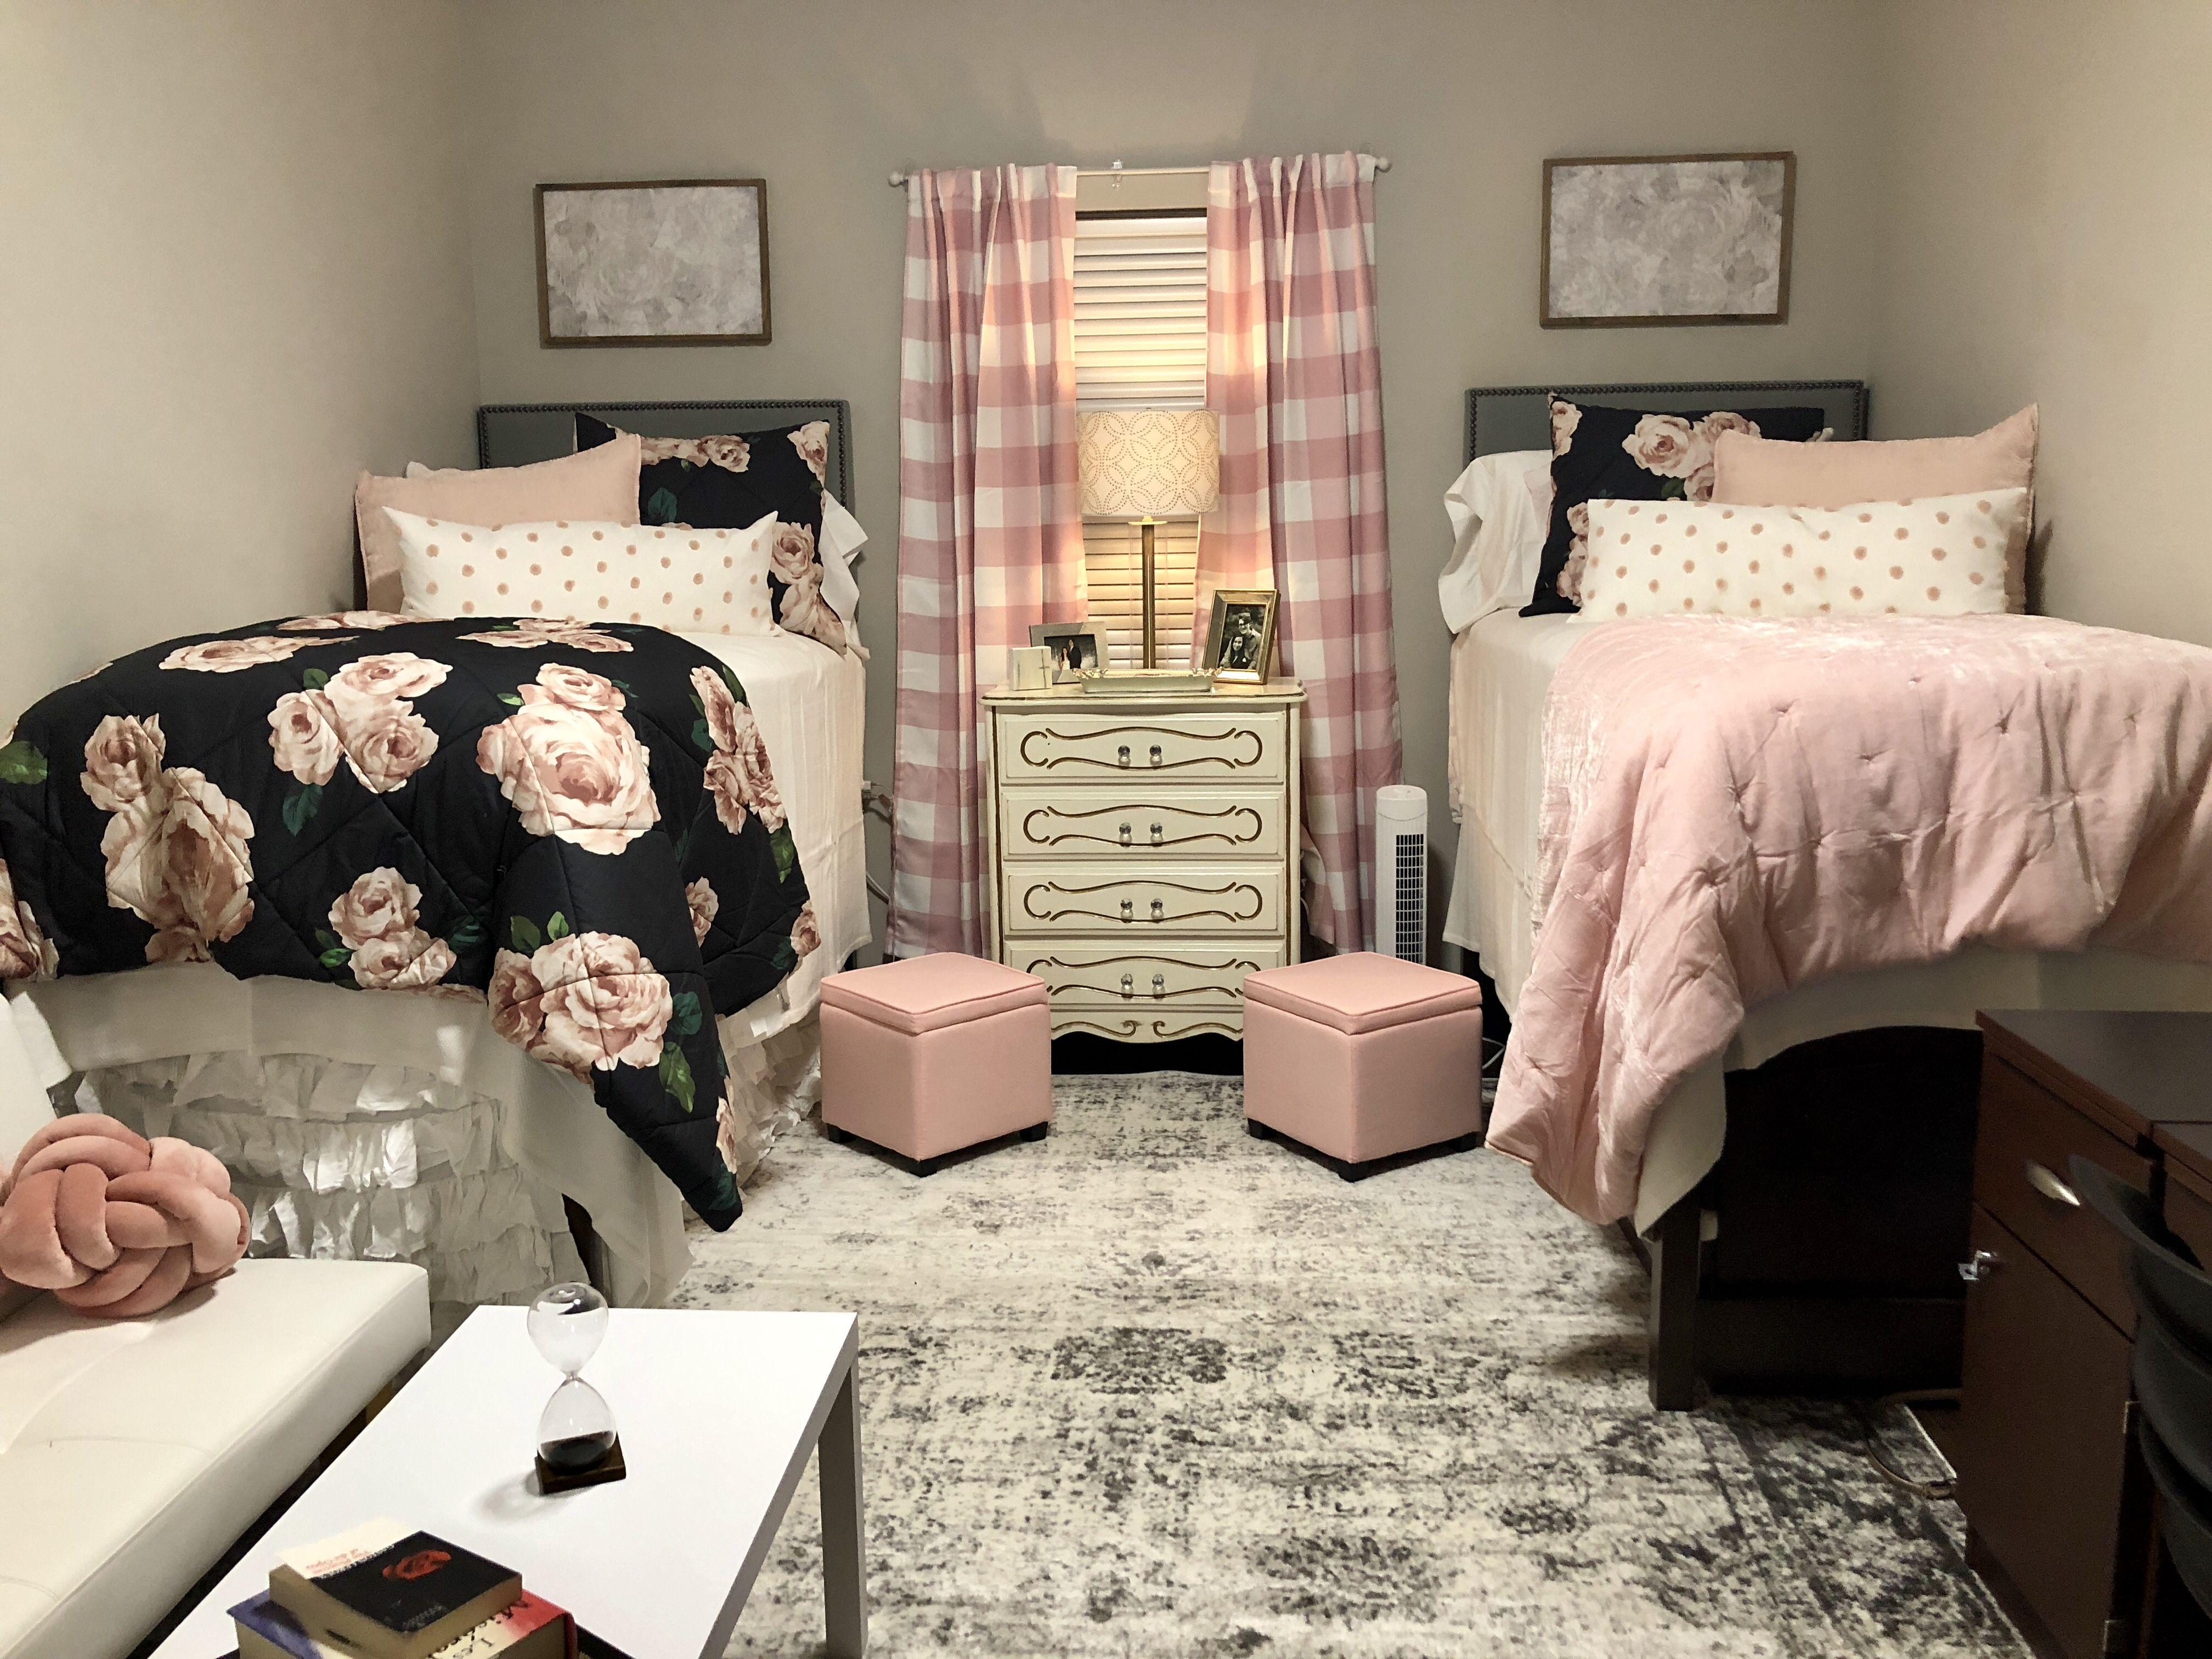 Rc South Ole Miss Dorm Room Ole Miss Dorm Rooms College Bedroom Decor Dorm Room Decor